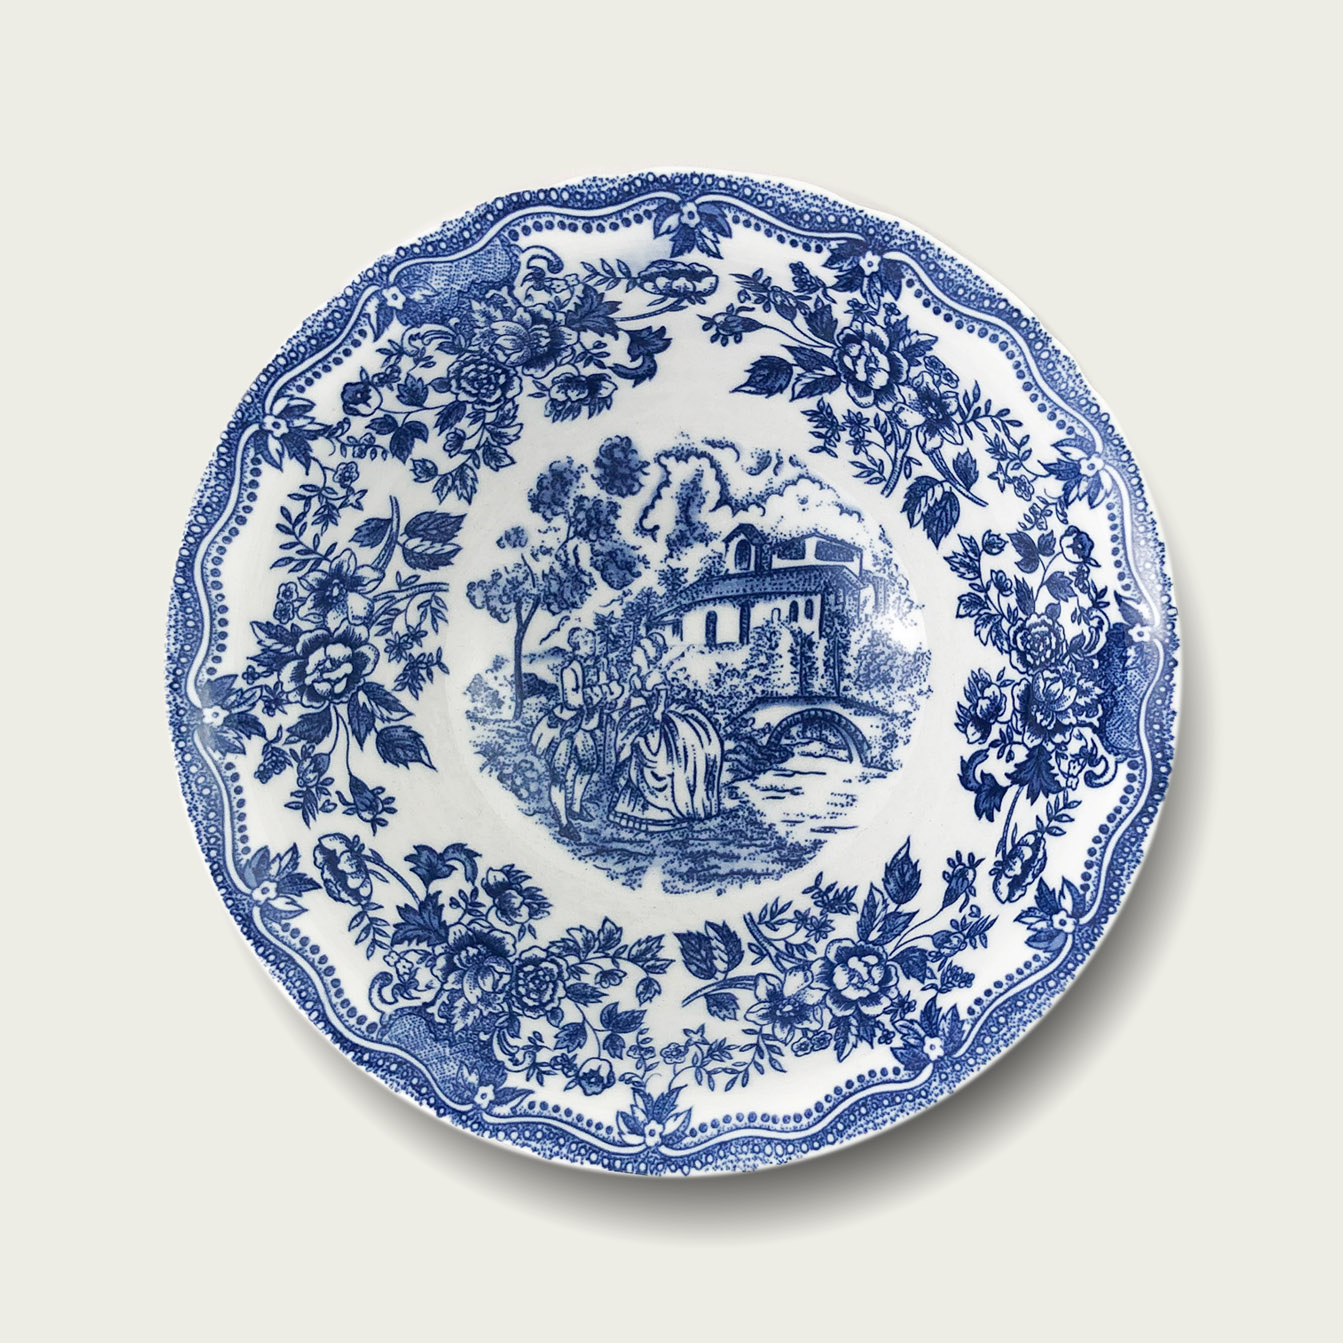 Ciotola in porcellana - fantasia inglese blu